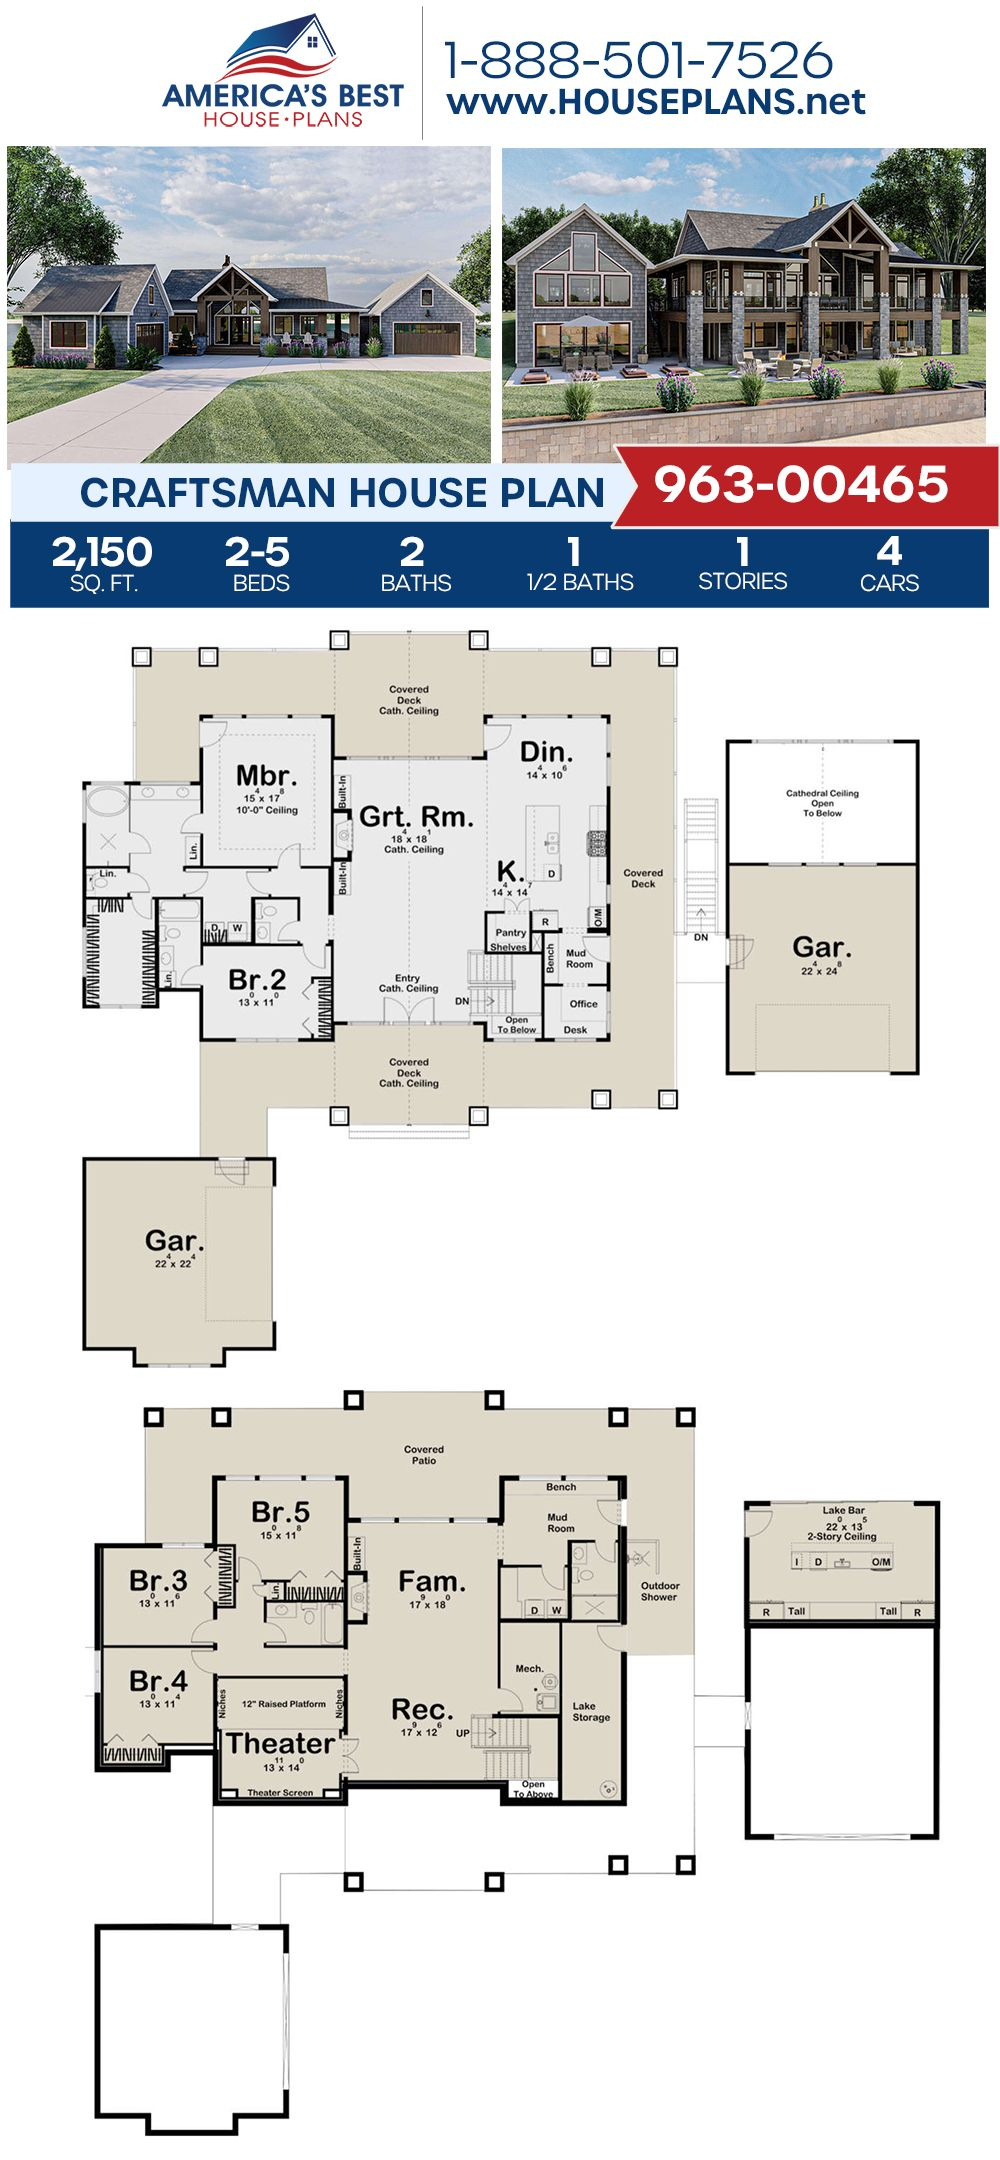 House Plan 963 00465 Craftsman Plan 2 150 Square Feet 2 5 Bedrooms 2 5 Bathrooms In 2020 Lake House Plans Craftsman House Plan House Plans